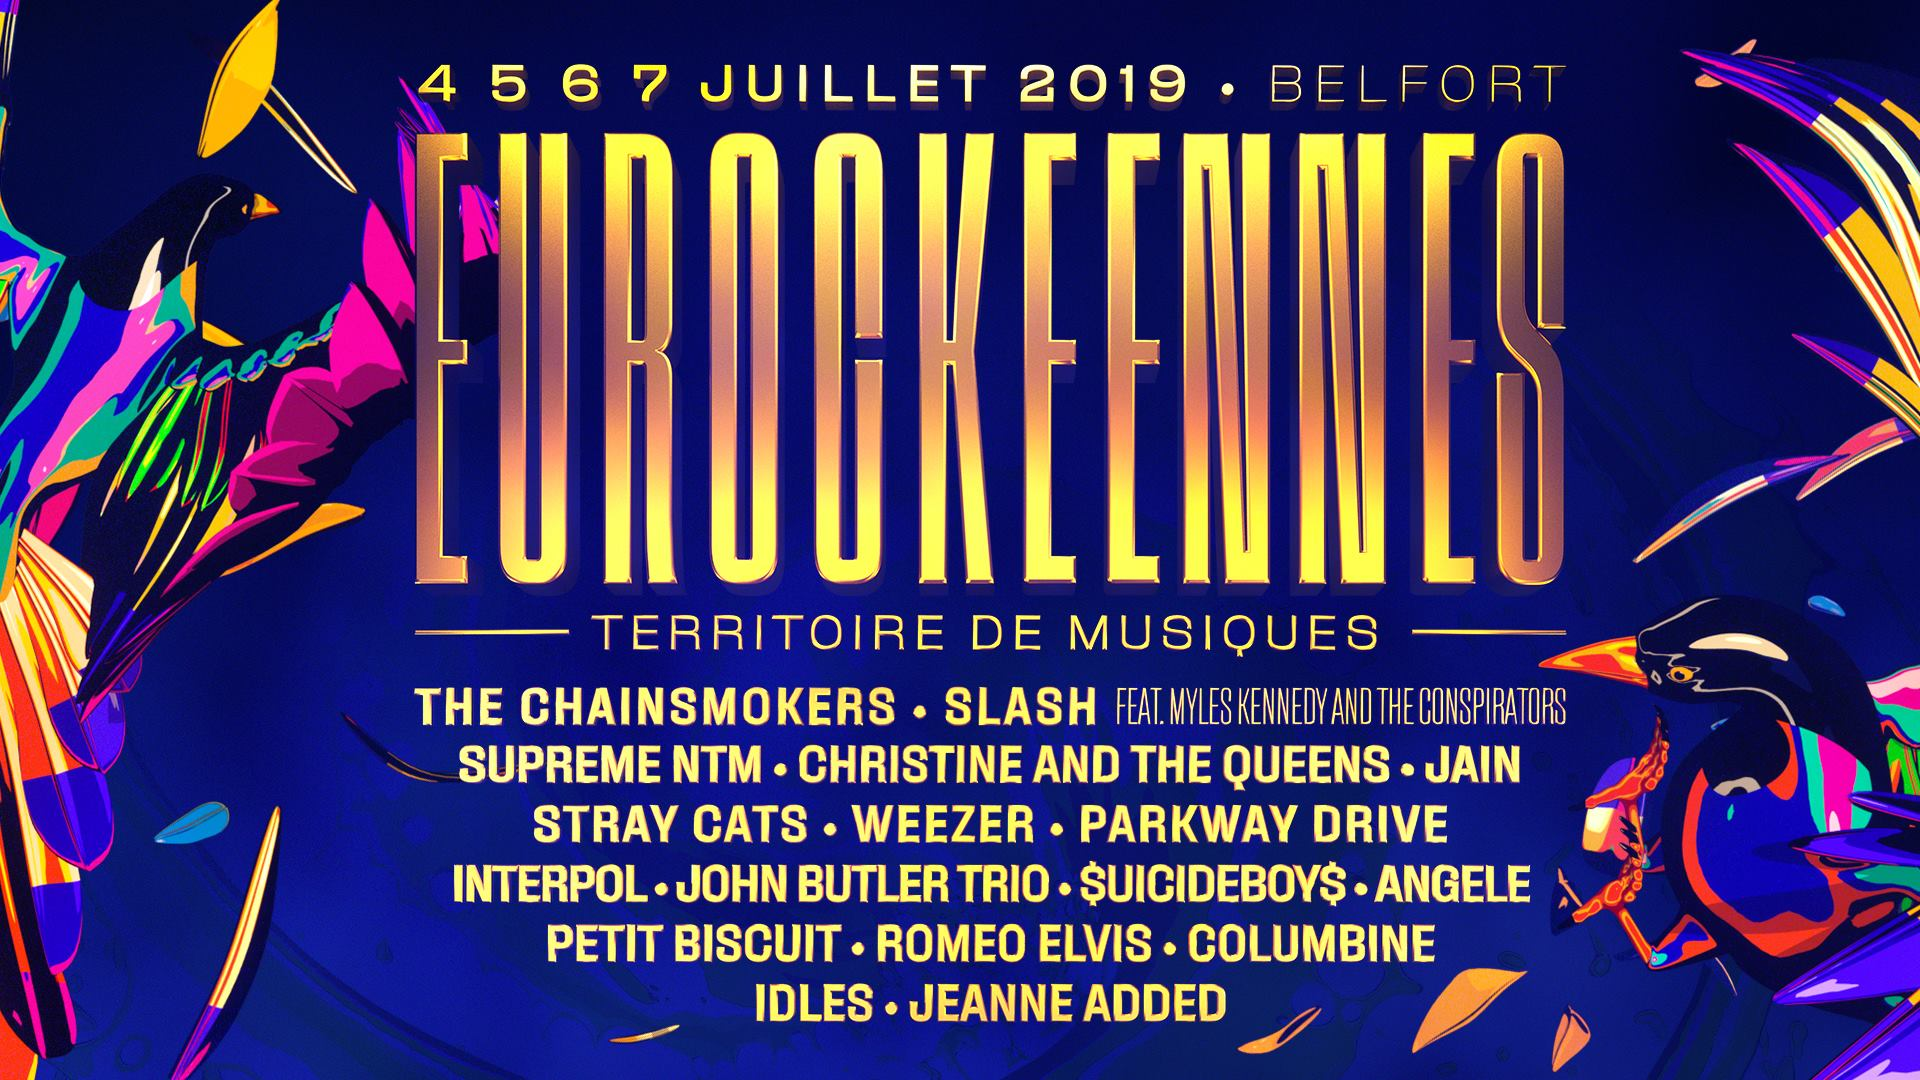 Eurockéennes 2019 - 04/07/2019 (4 days) - Belfort ...